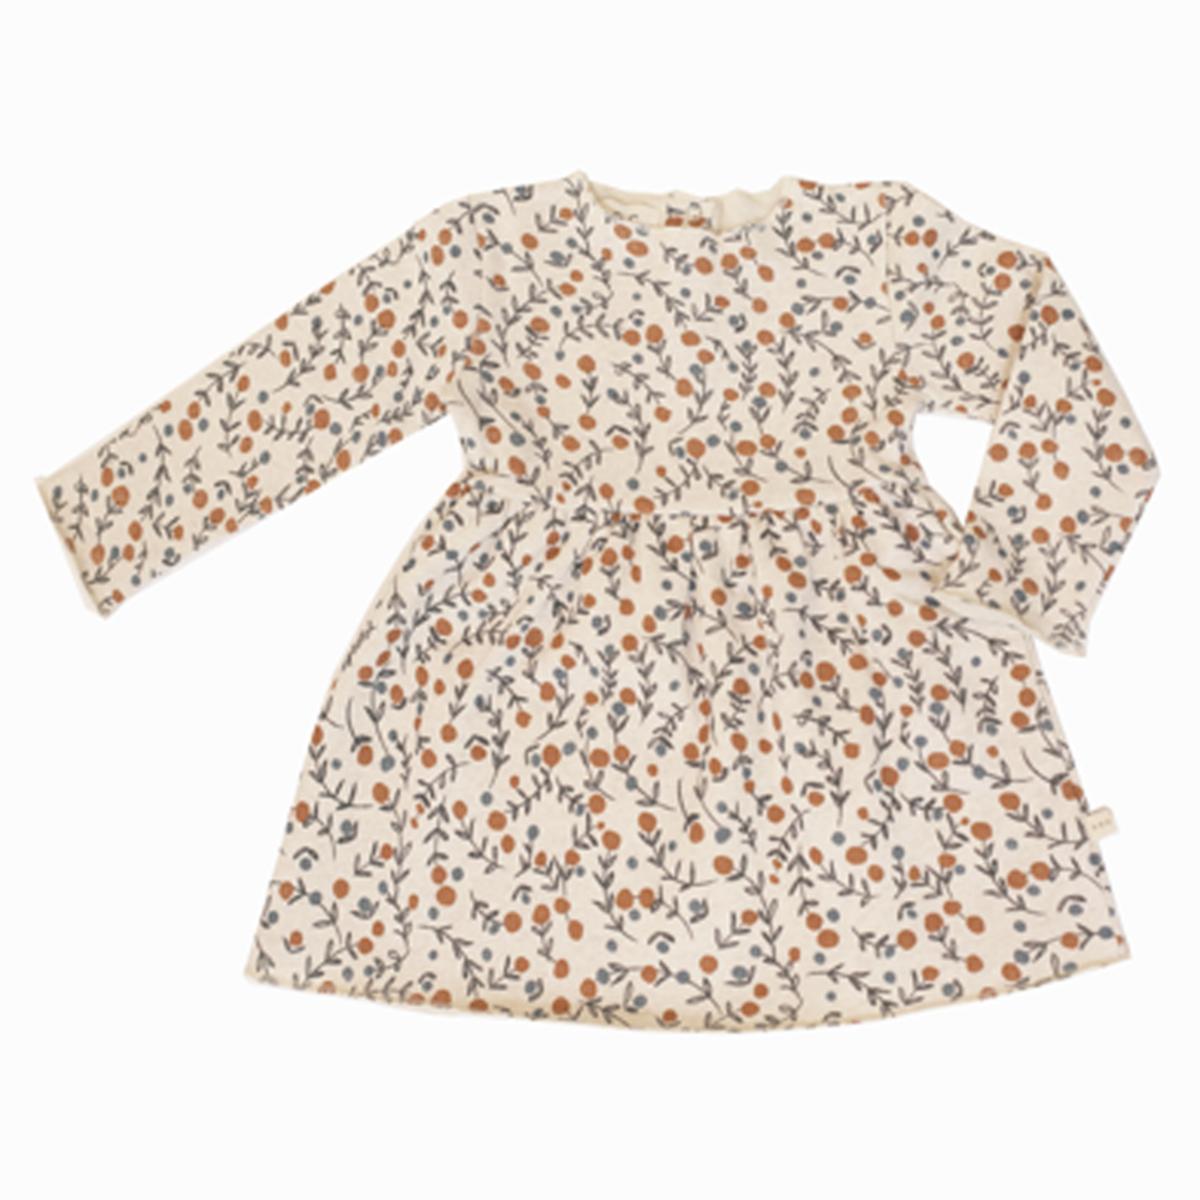 Robe & combinaison Robe Robyn Crème et Petites Fleurs - 2 Ans Robe Robyn Crème et Petites Fleurs - 2 Ans